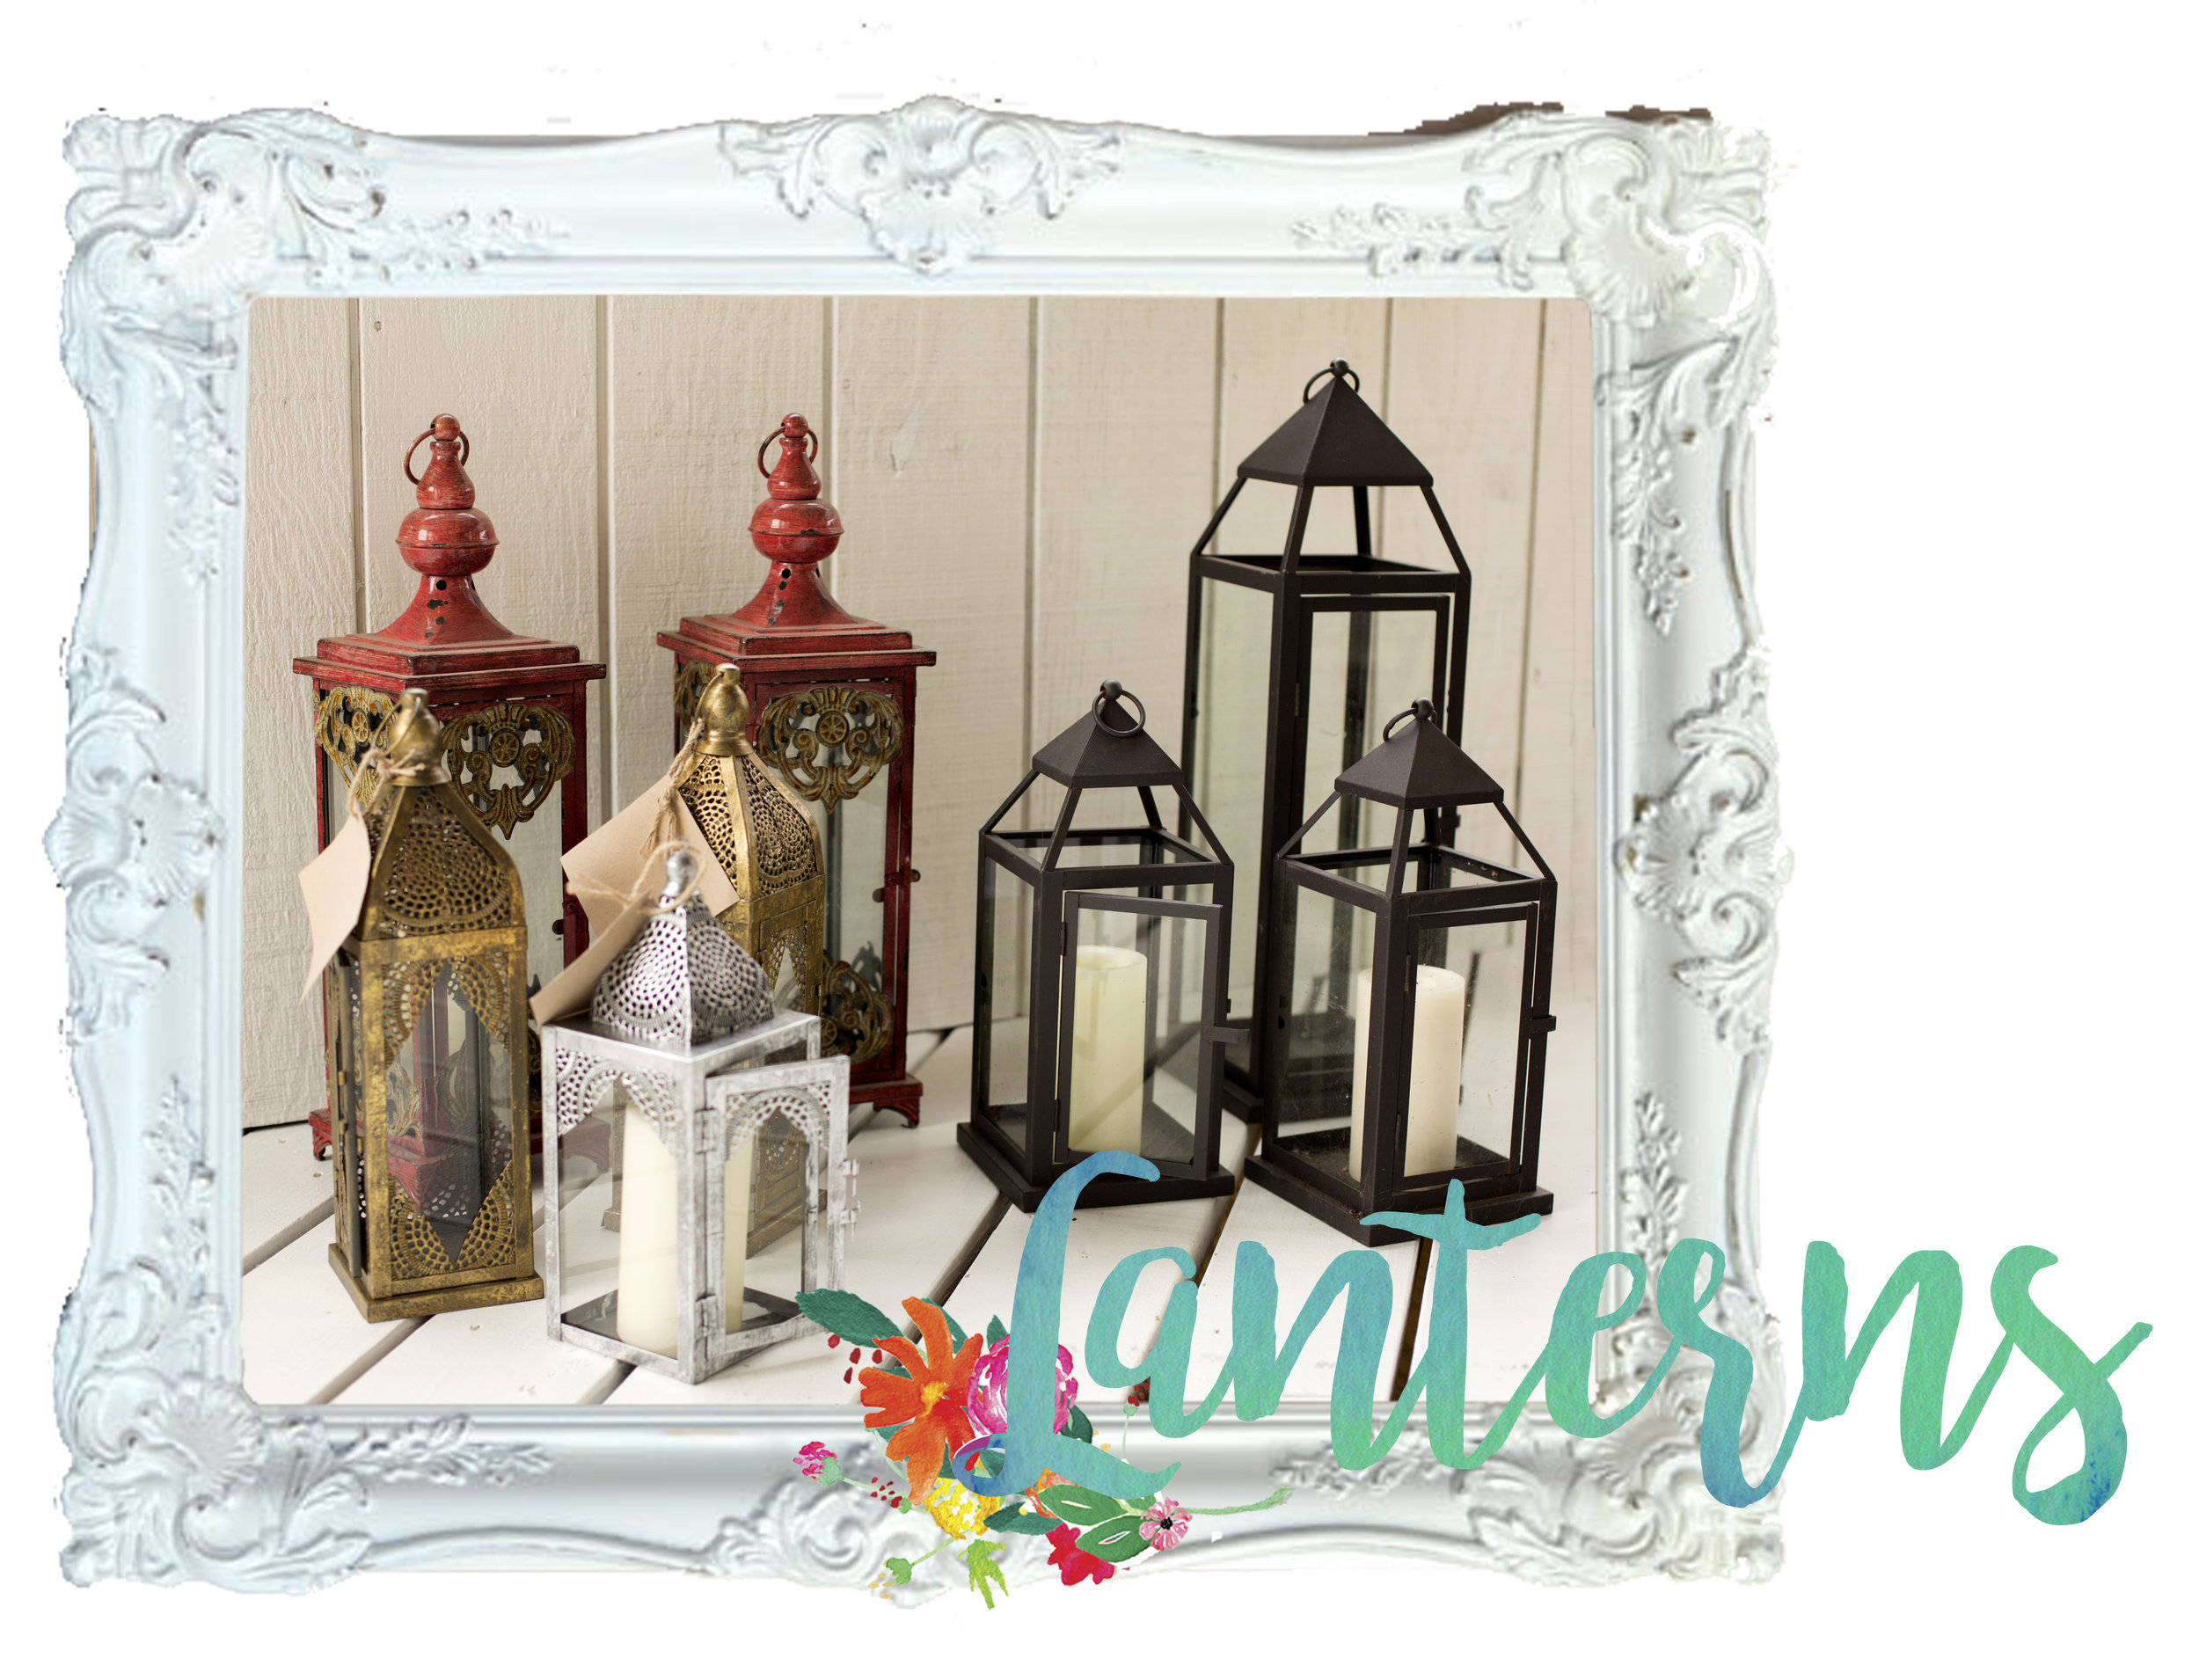 lanterns_for_rent.jpg